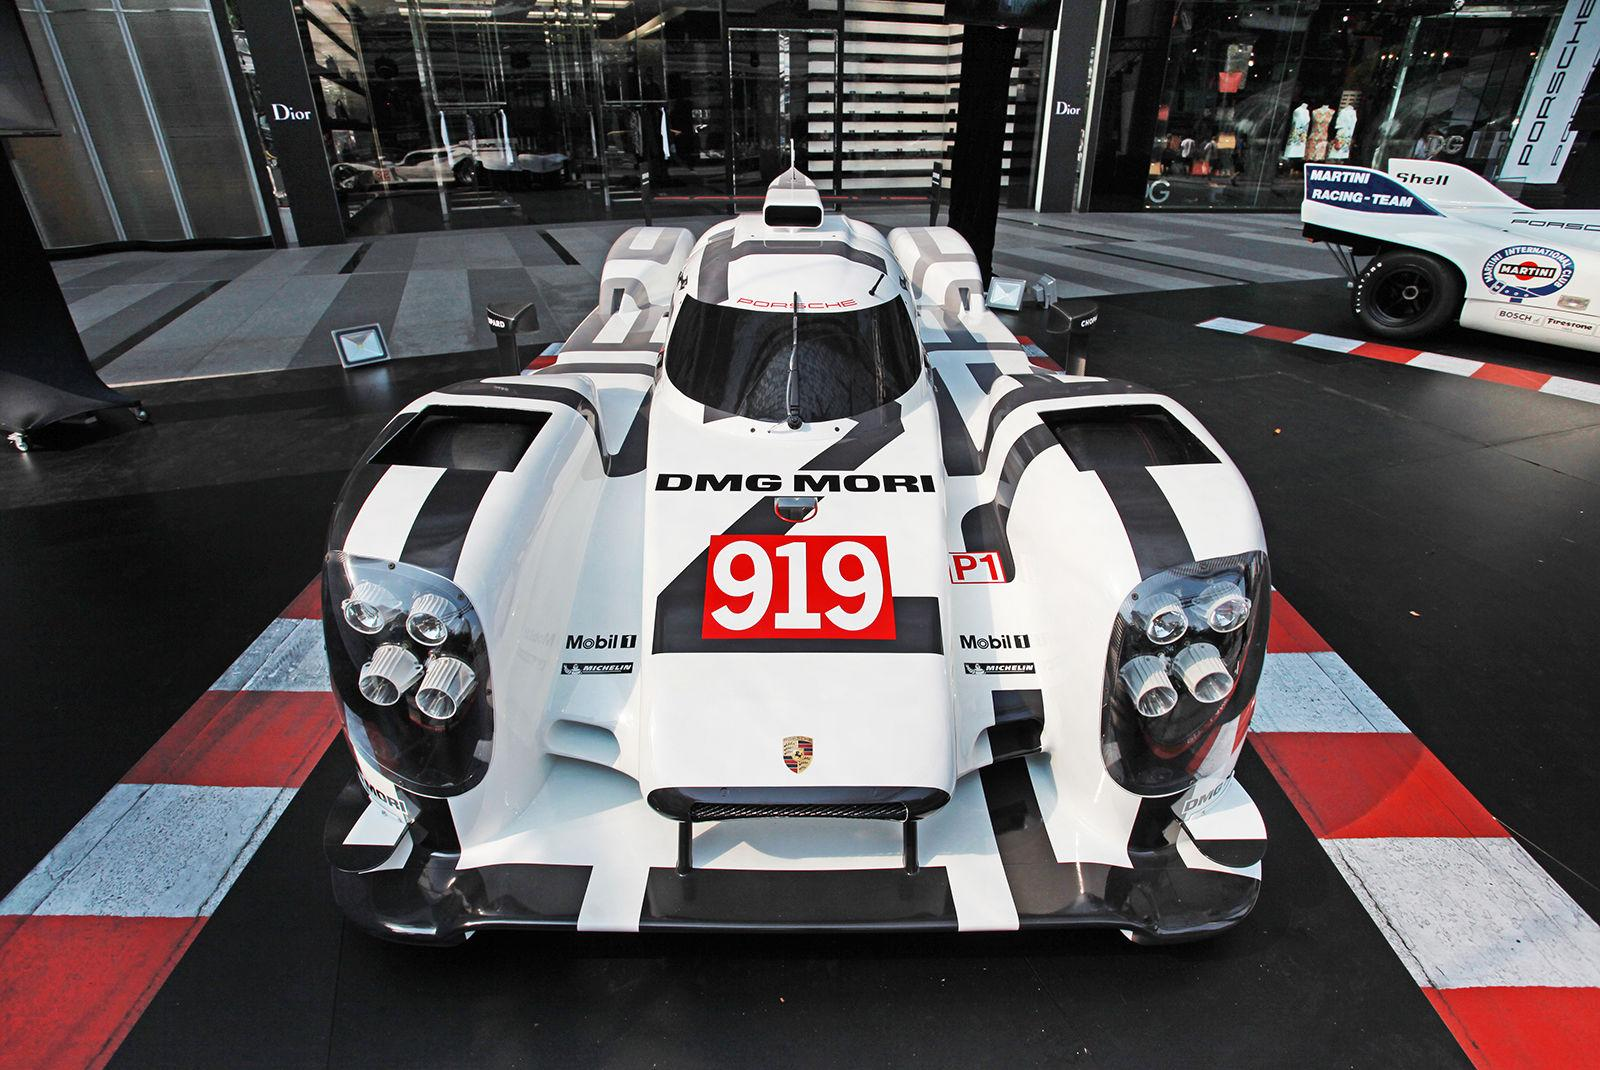 Porsche 919 Hybrid échelle 1:1